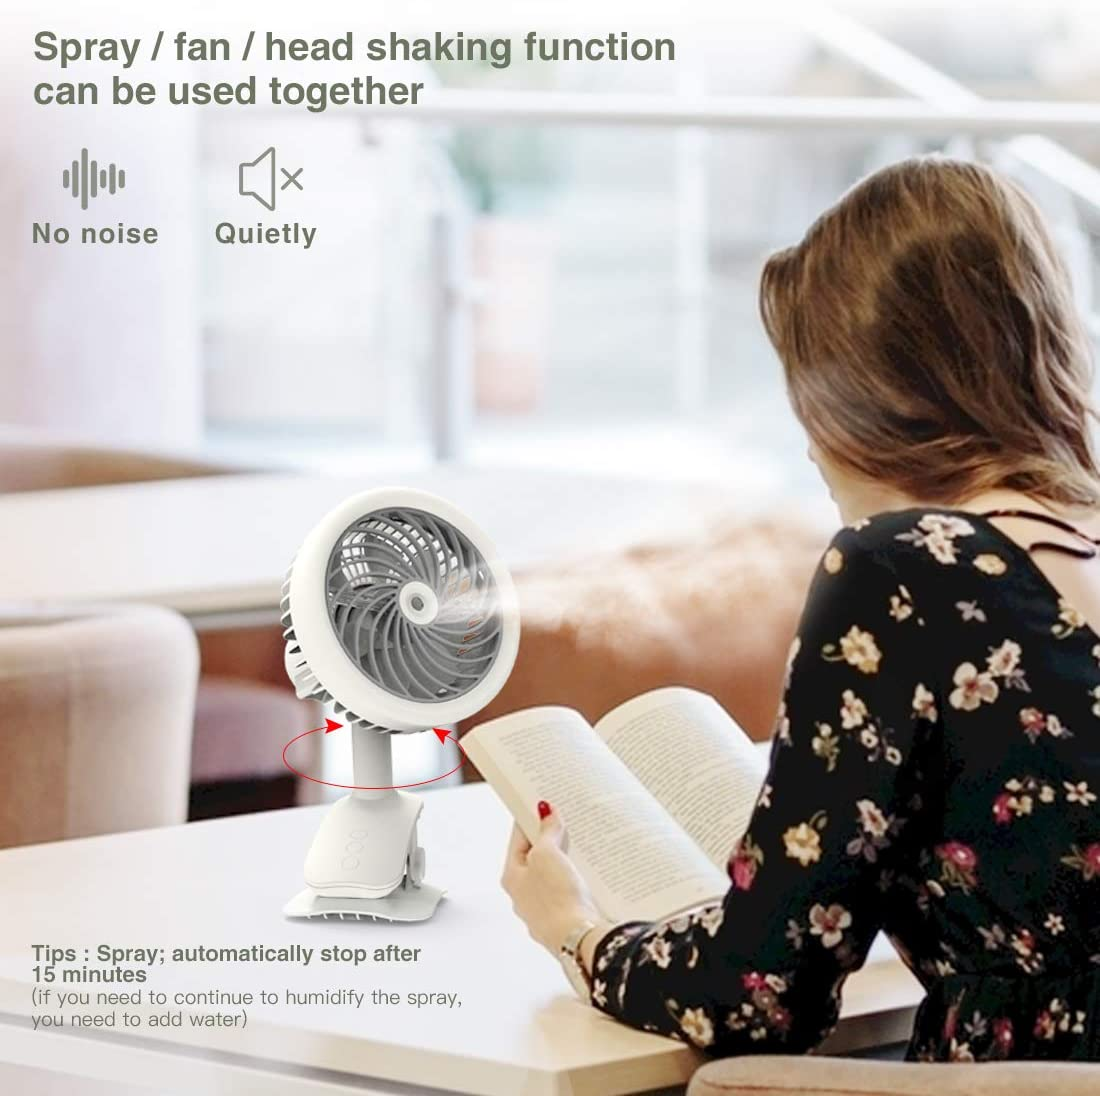 1 marce vento freddo ufficio desktop air cooler fan per casa esterno cucina casa Air cooler umidificatore portatile climatizzatore con 4